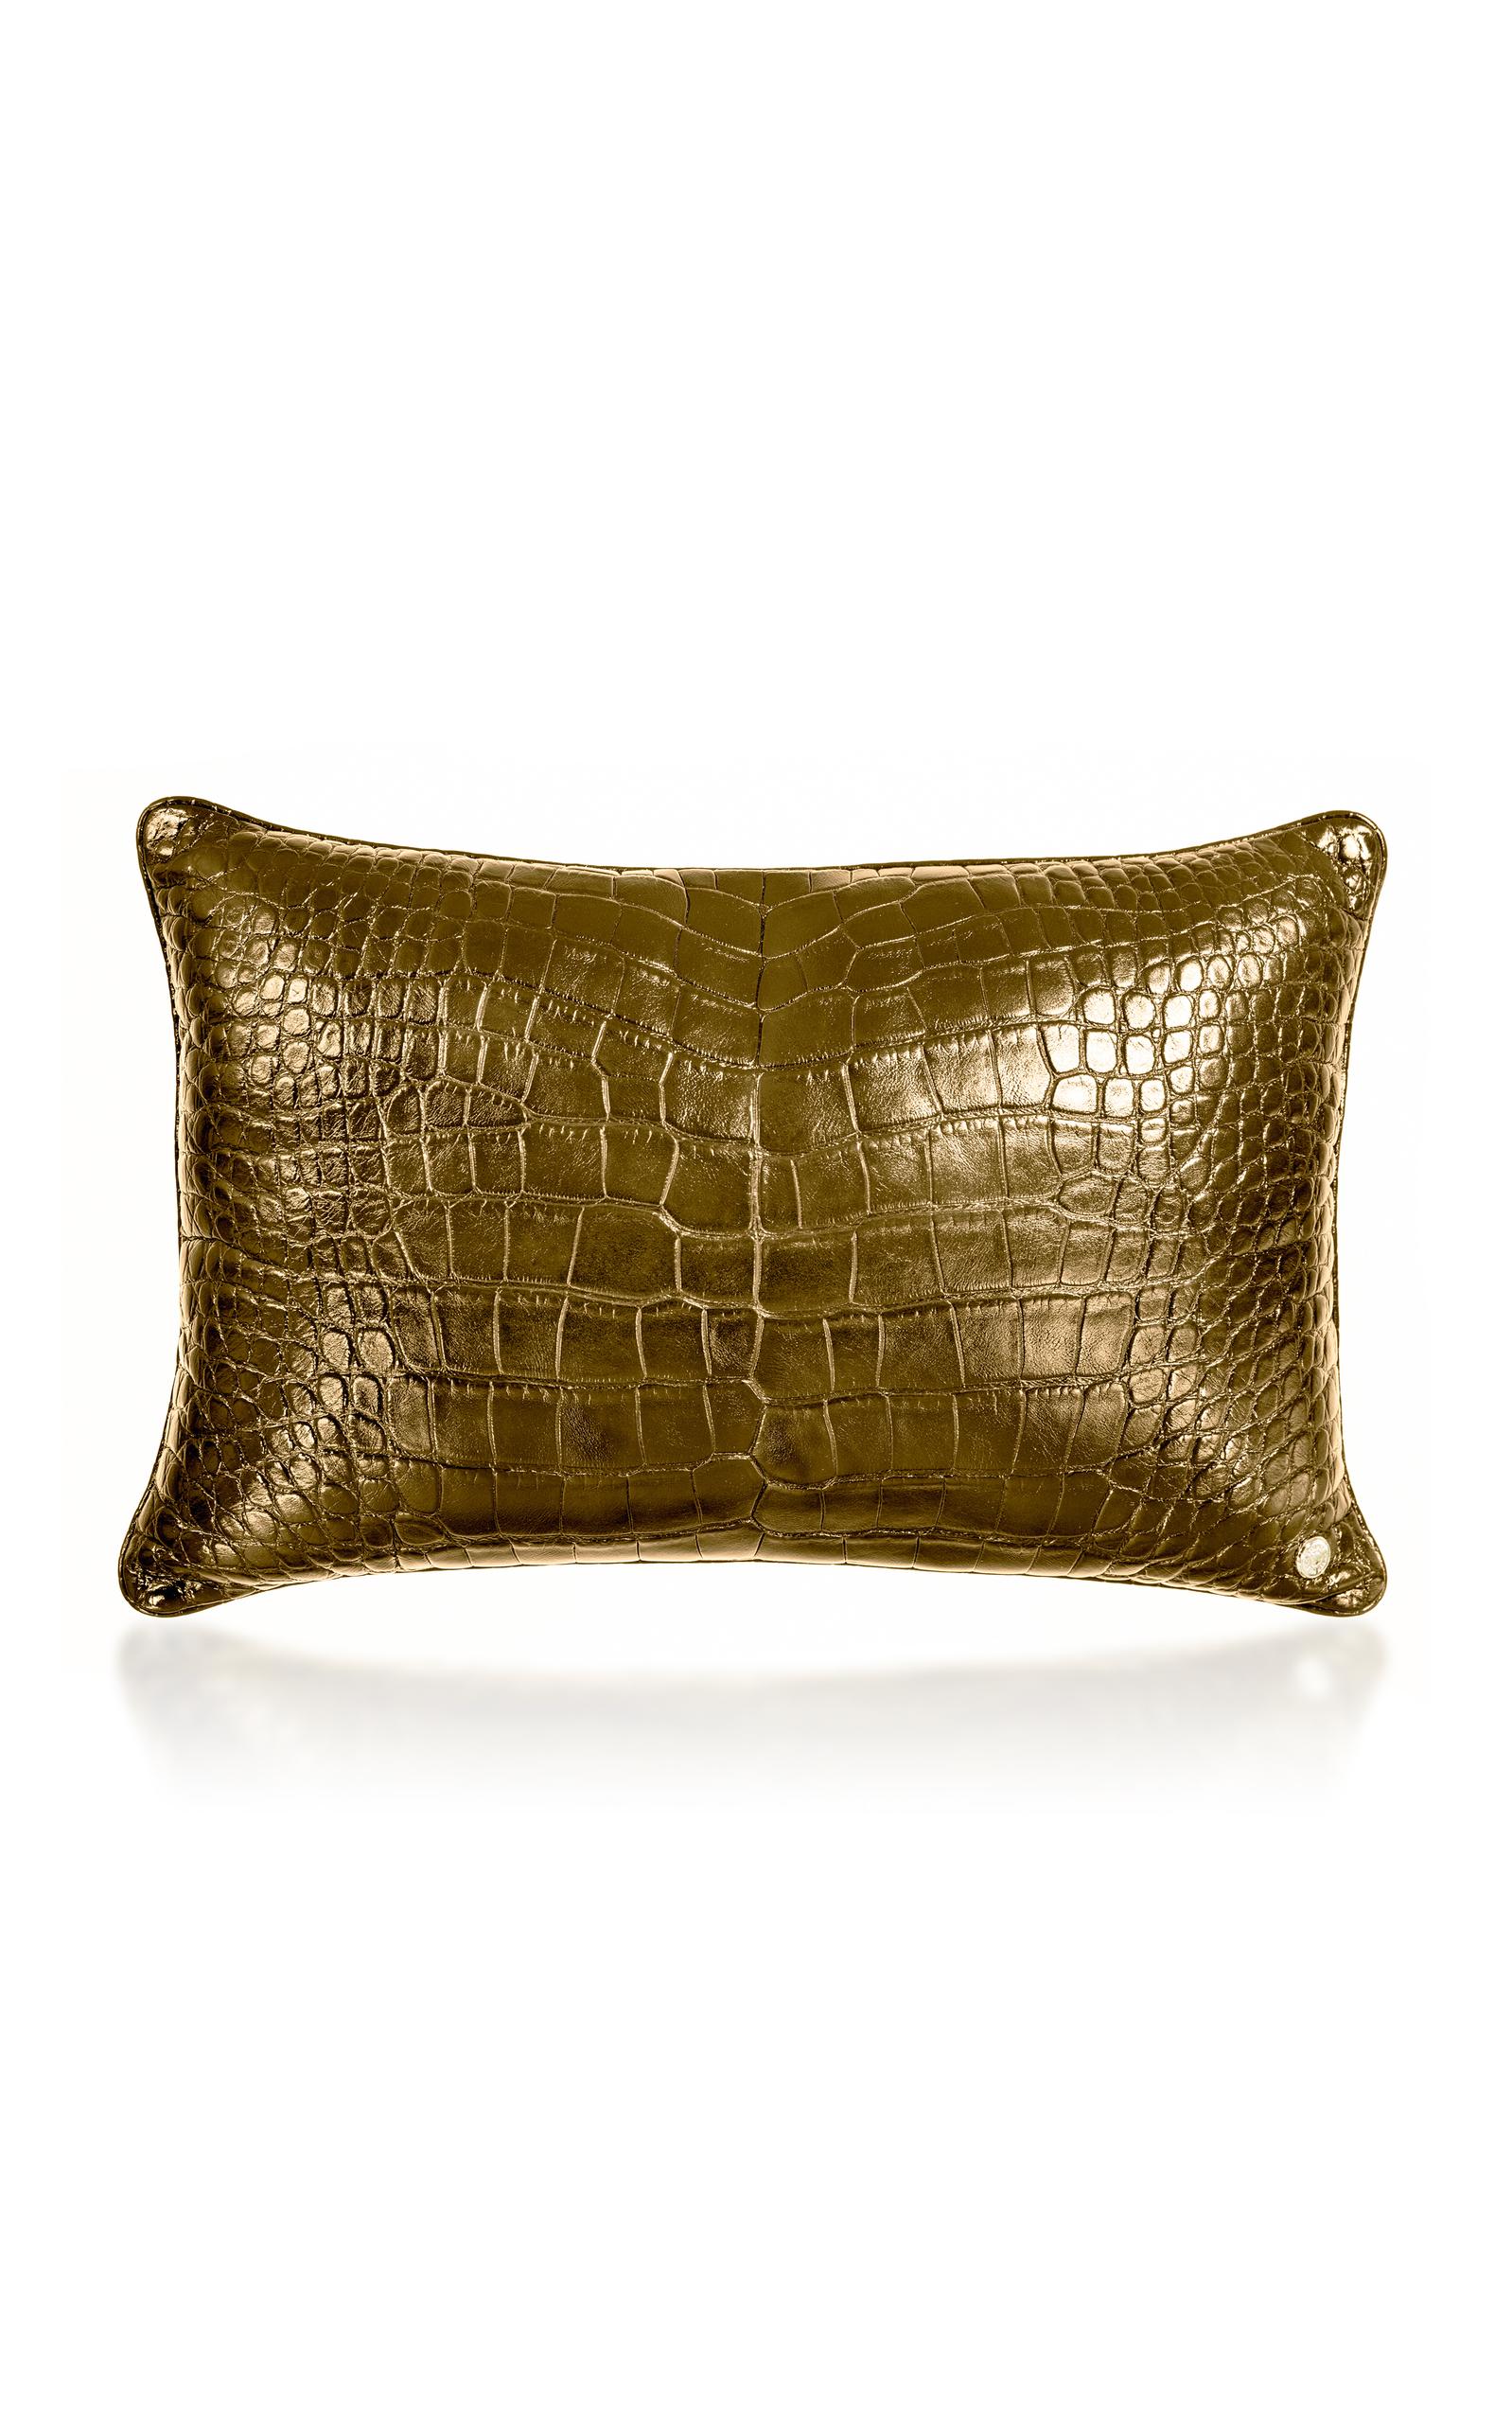 Stalvey – 24K Gold Crocodile Pillow – Color: Gold – Material: 24K GOLD ALLIGATOR – Moda Operandi